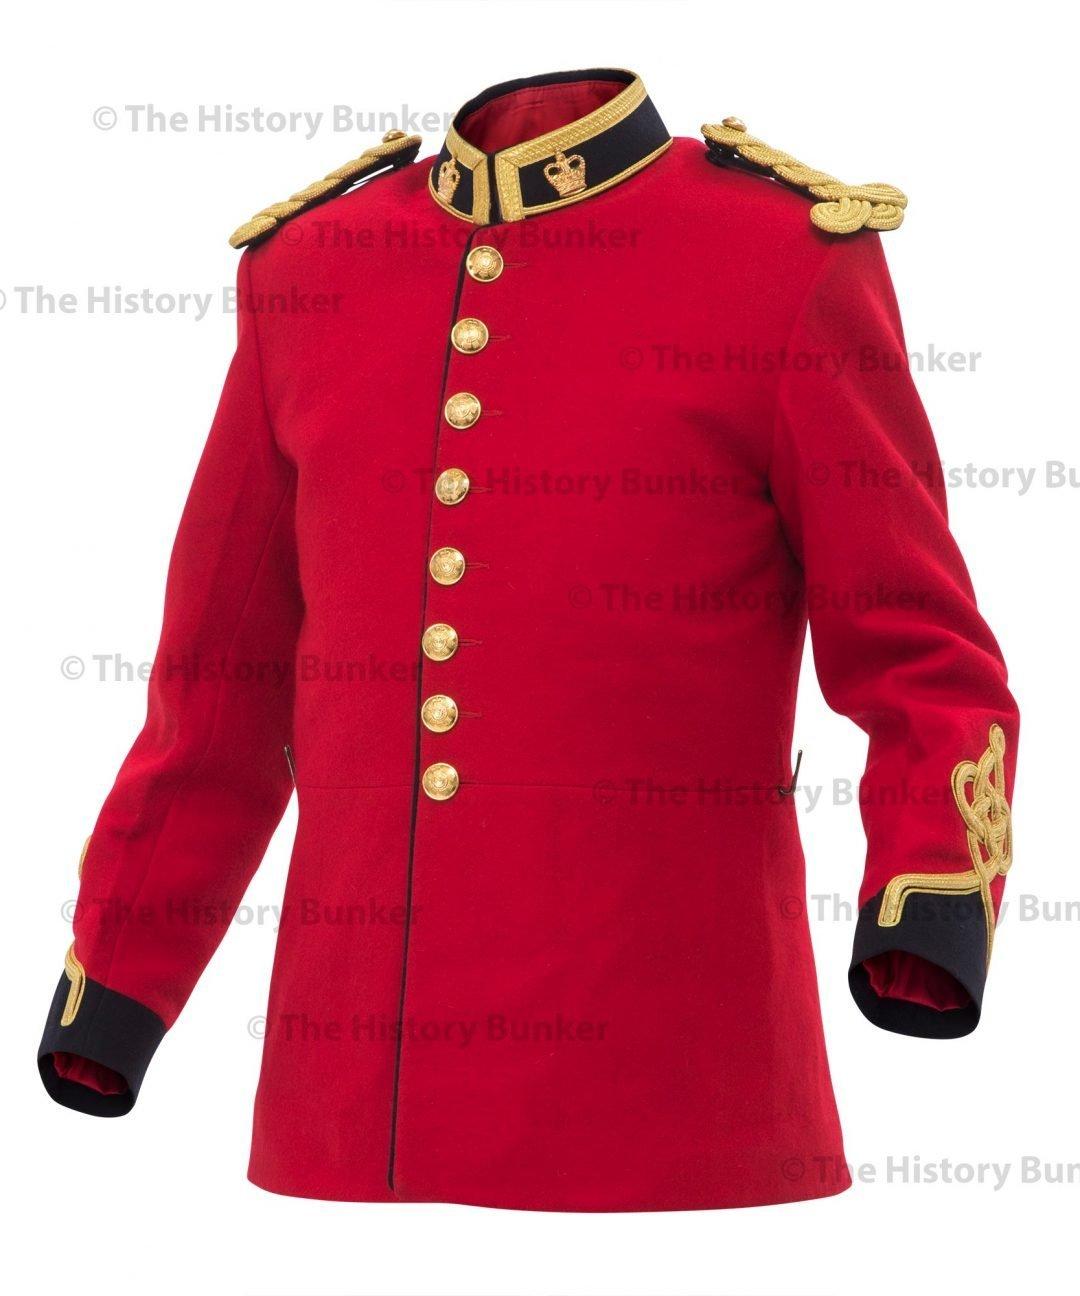 British Victorian uniforms and equipment